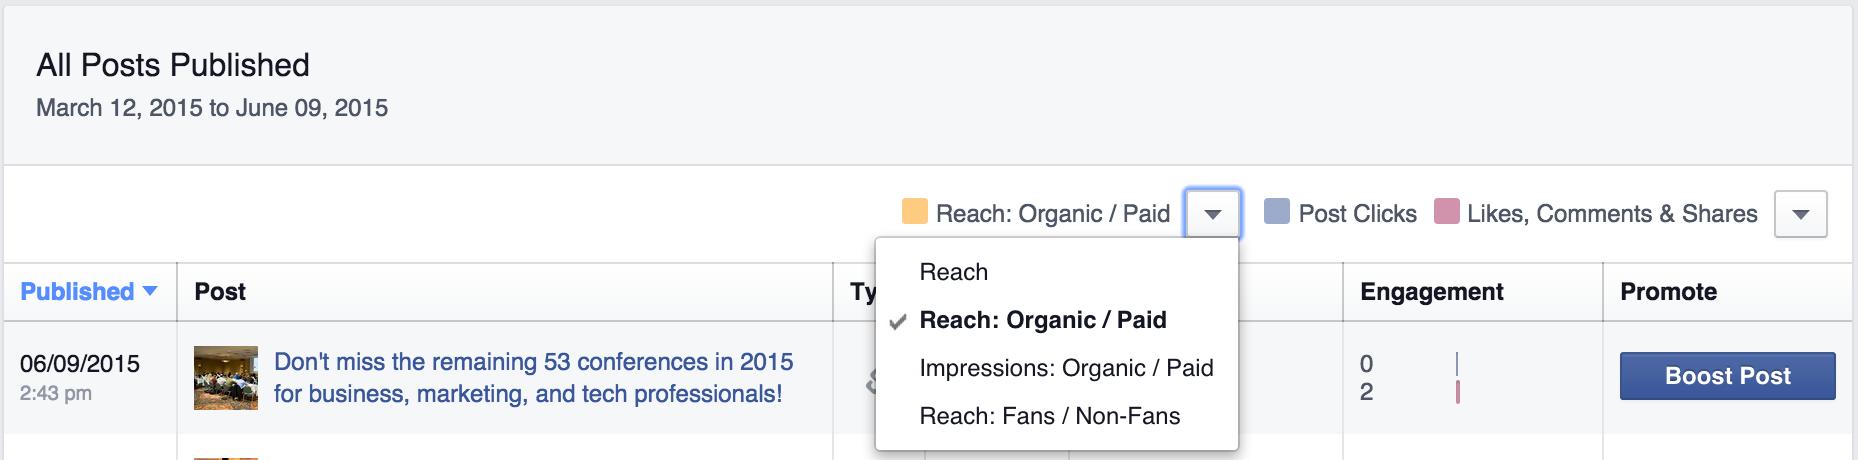 facebook metrics organic paid reach screenshot